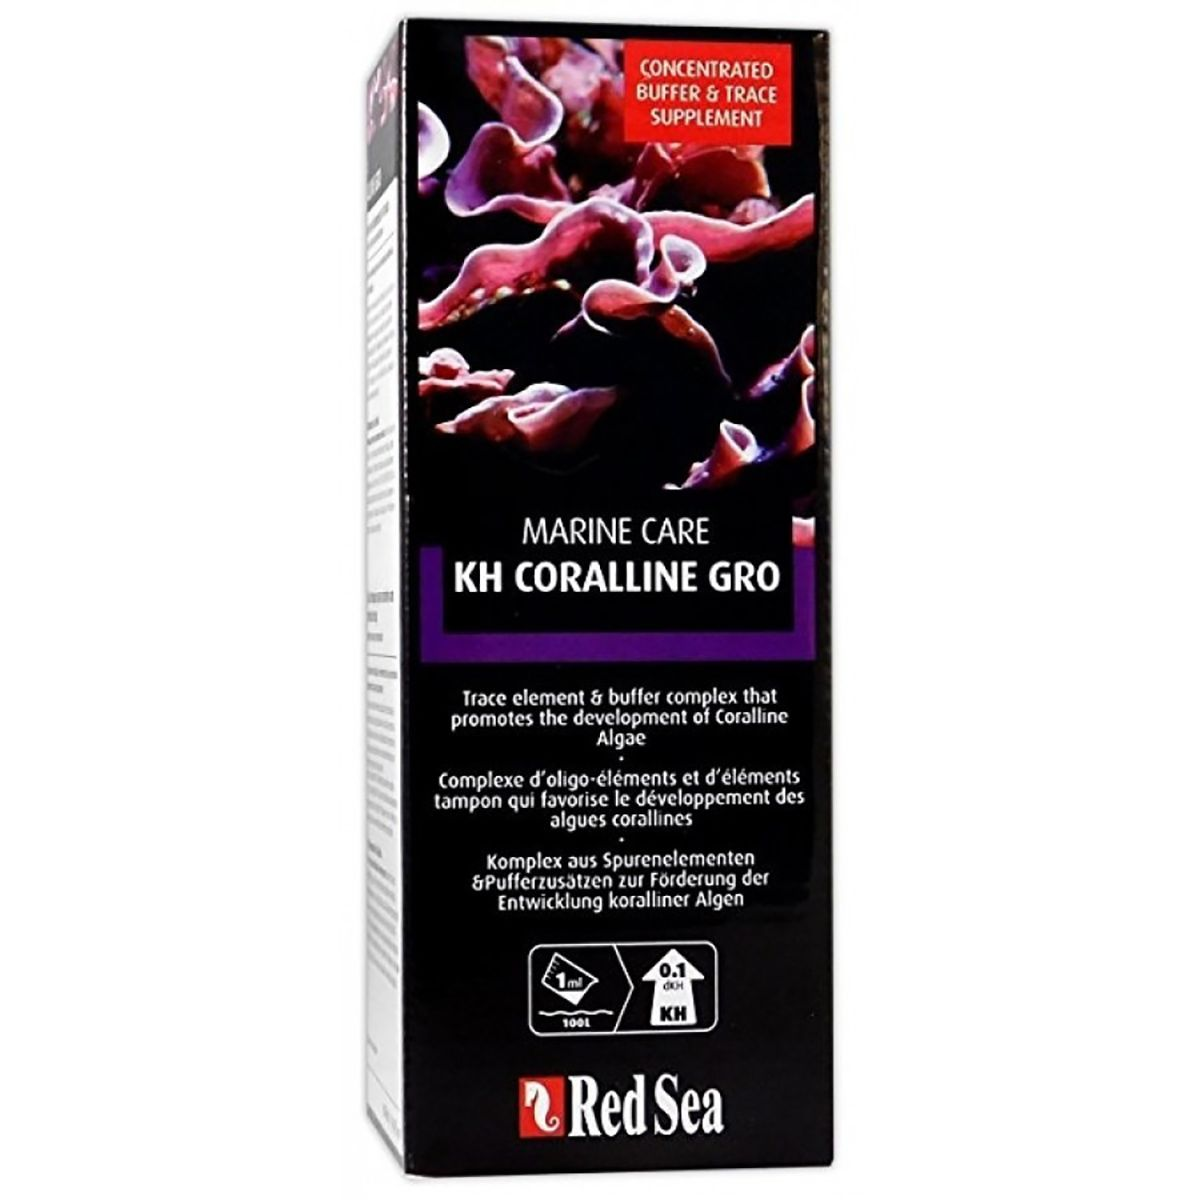 Suplemento Red Sea Kh Coralline Gro 100ml